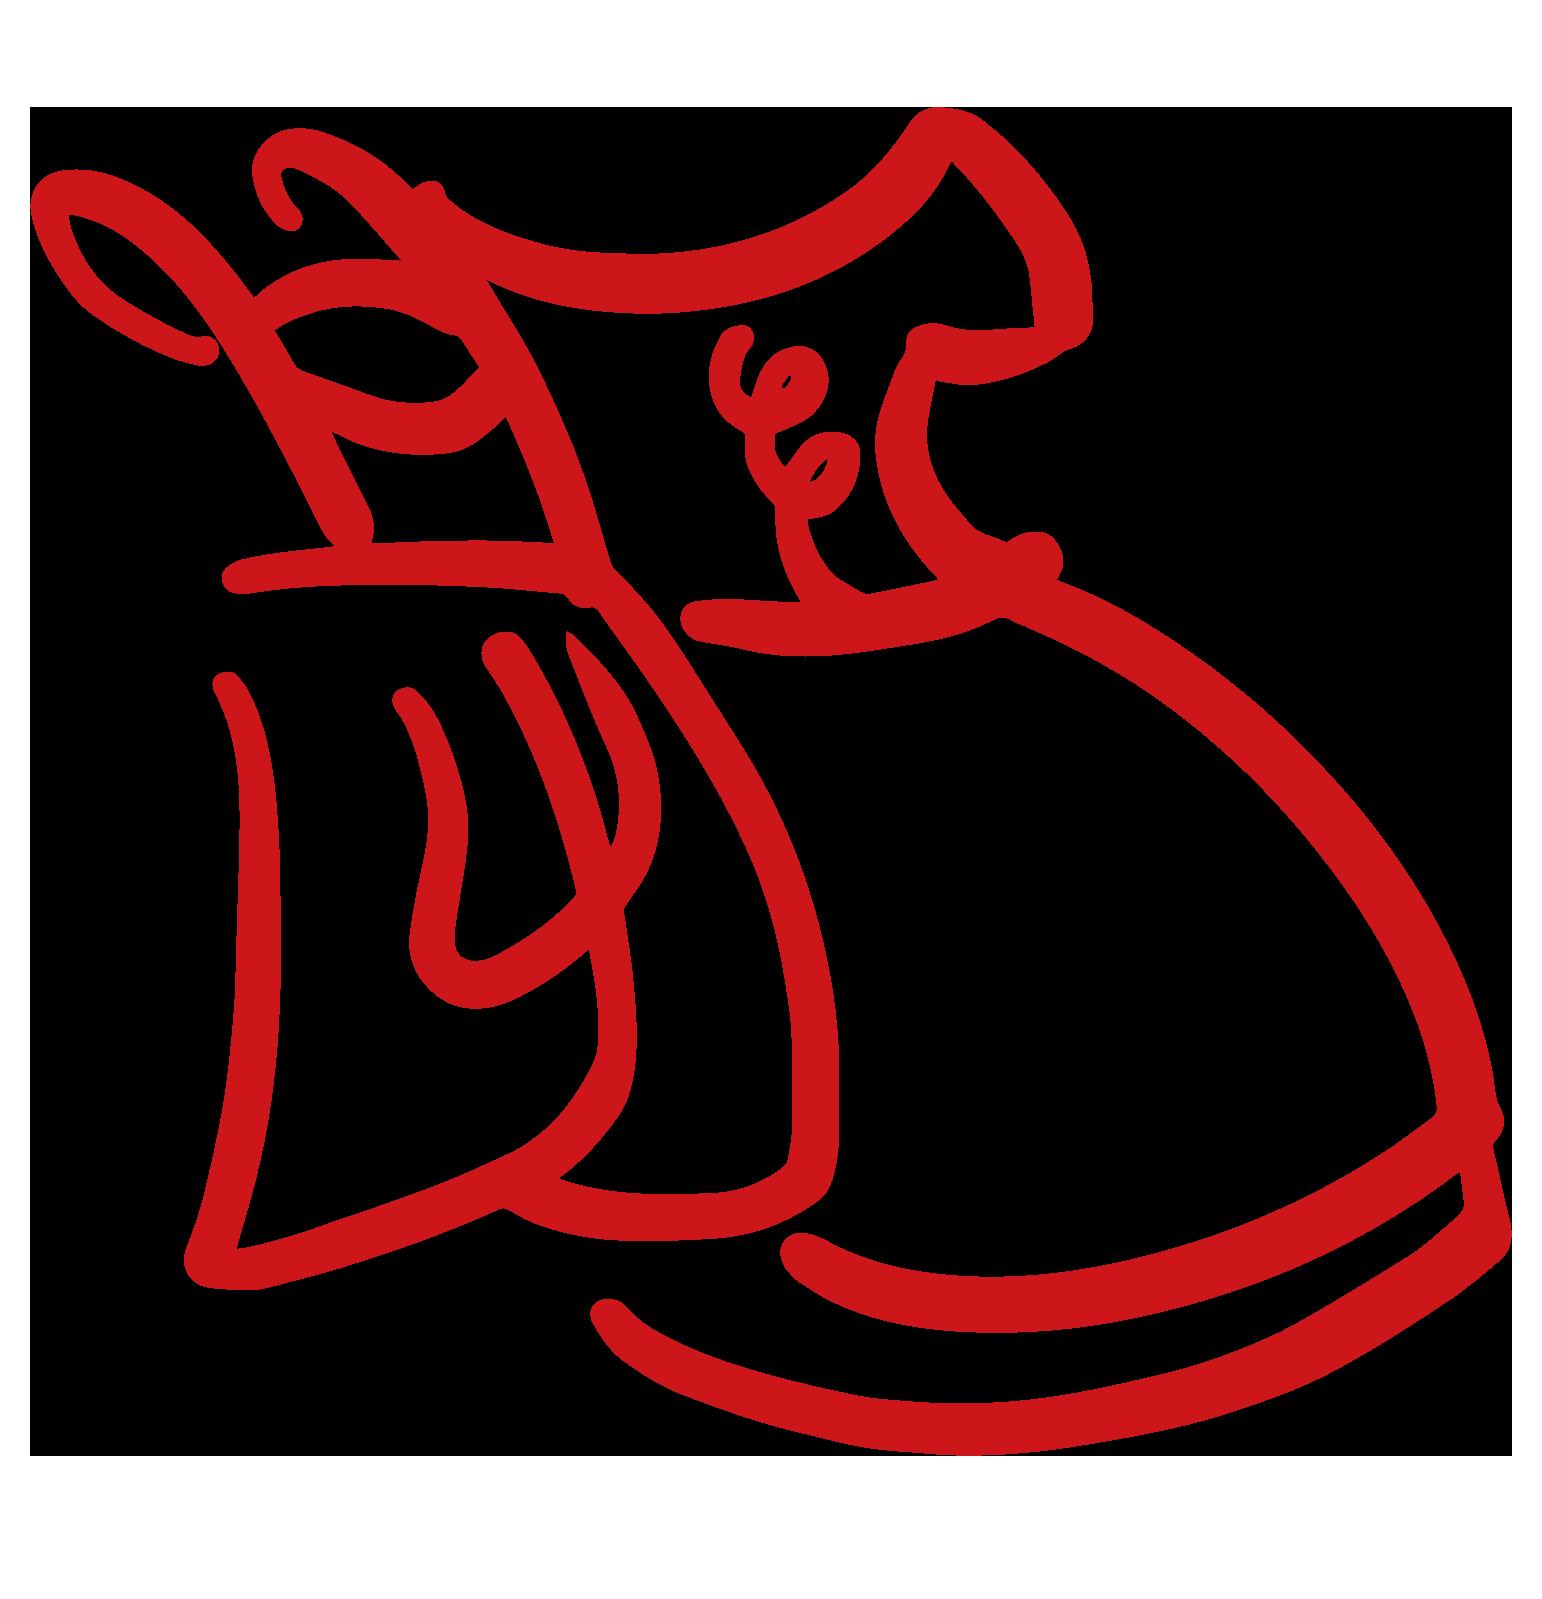 Trachtenkleid mit Gürtel, Petticoat Style, marineblau